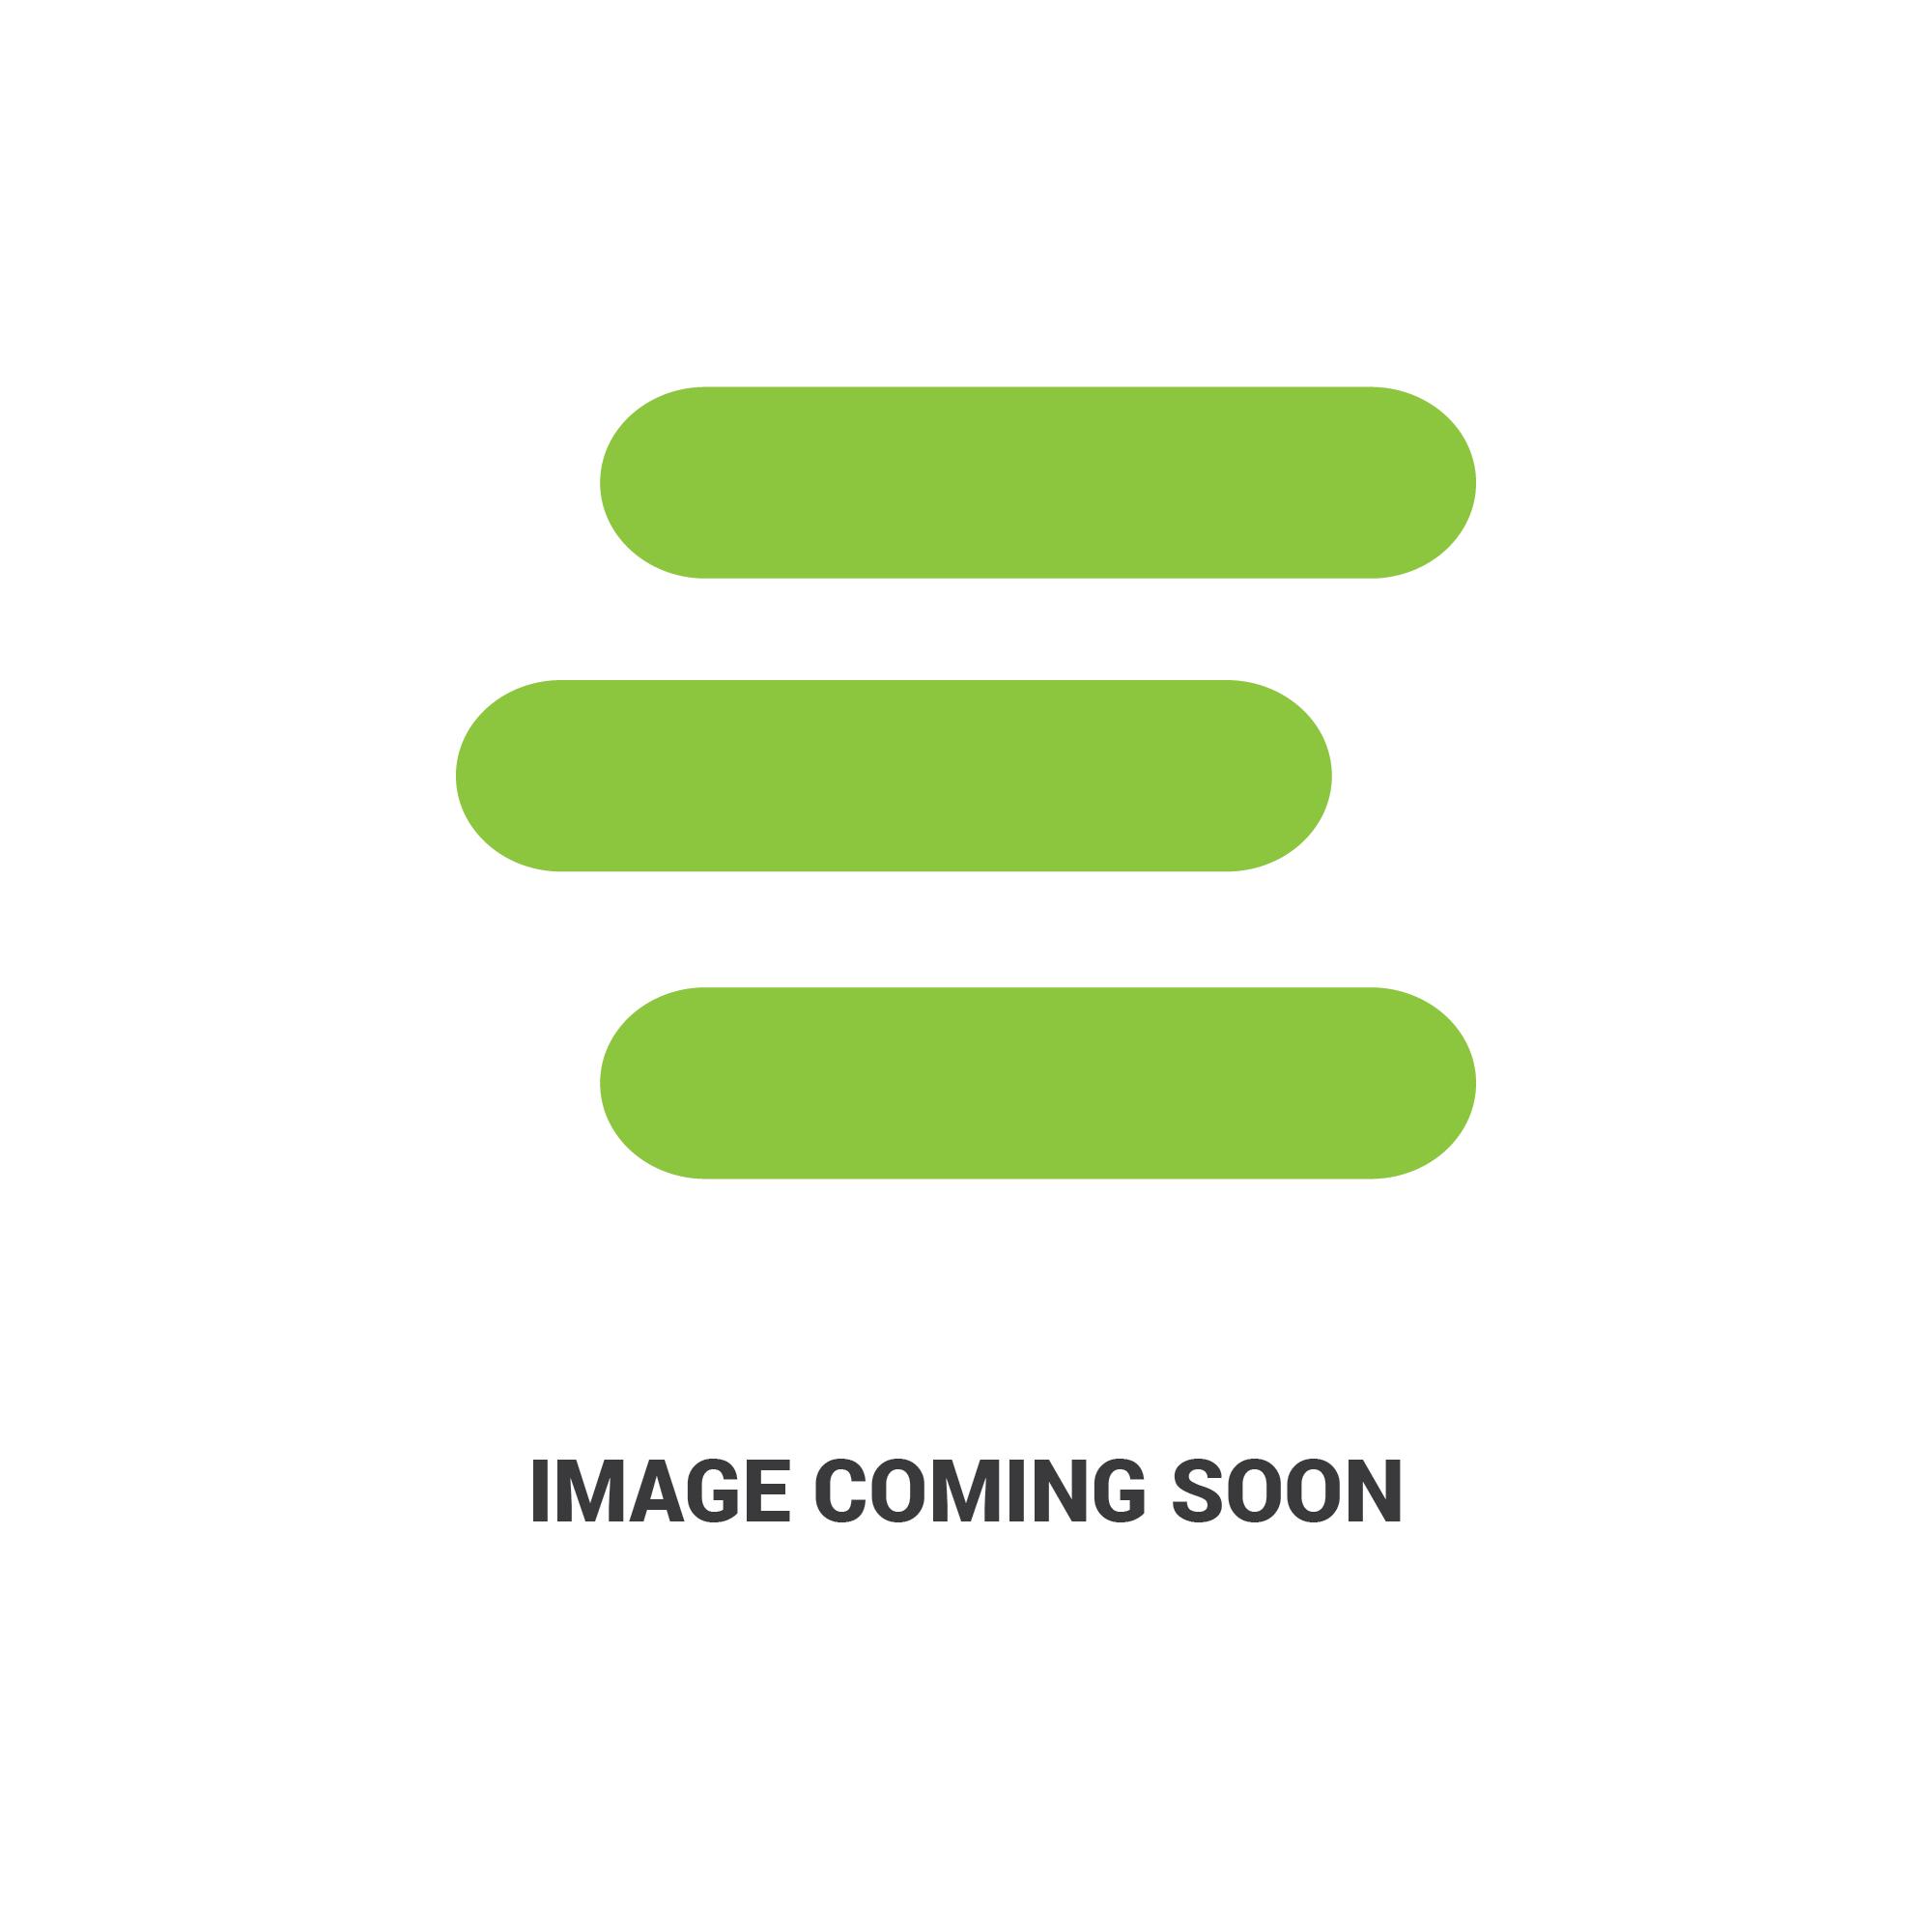 E-15241-32099edit 228.jpg